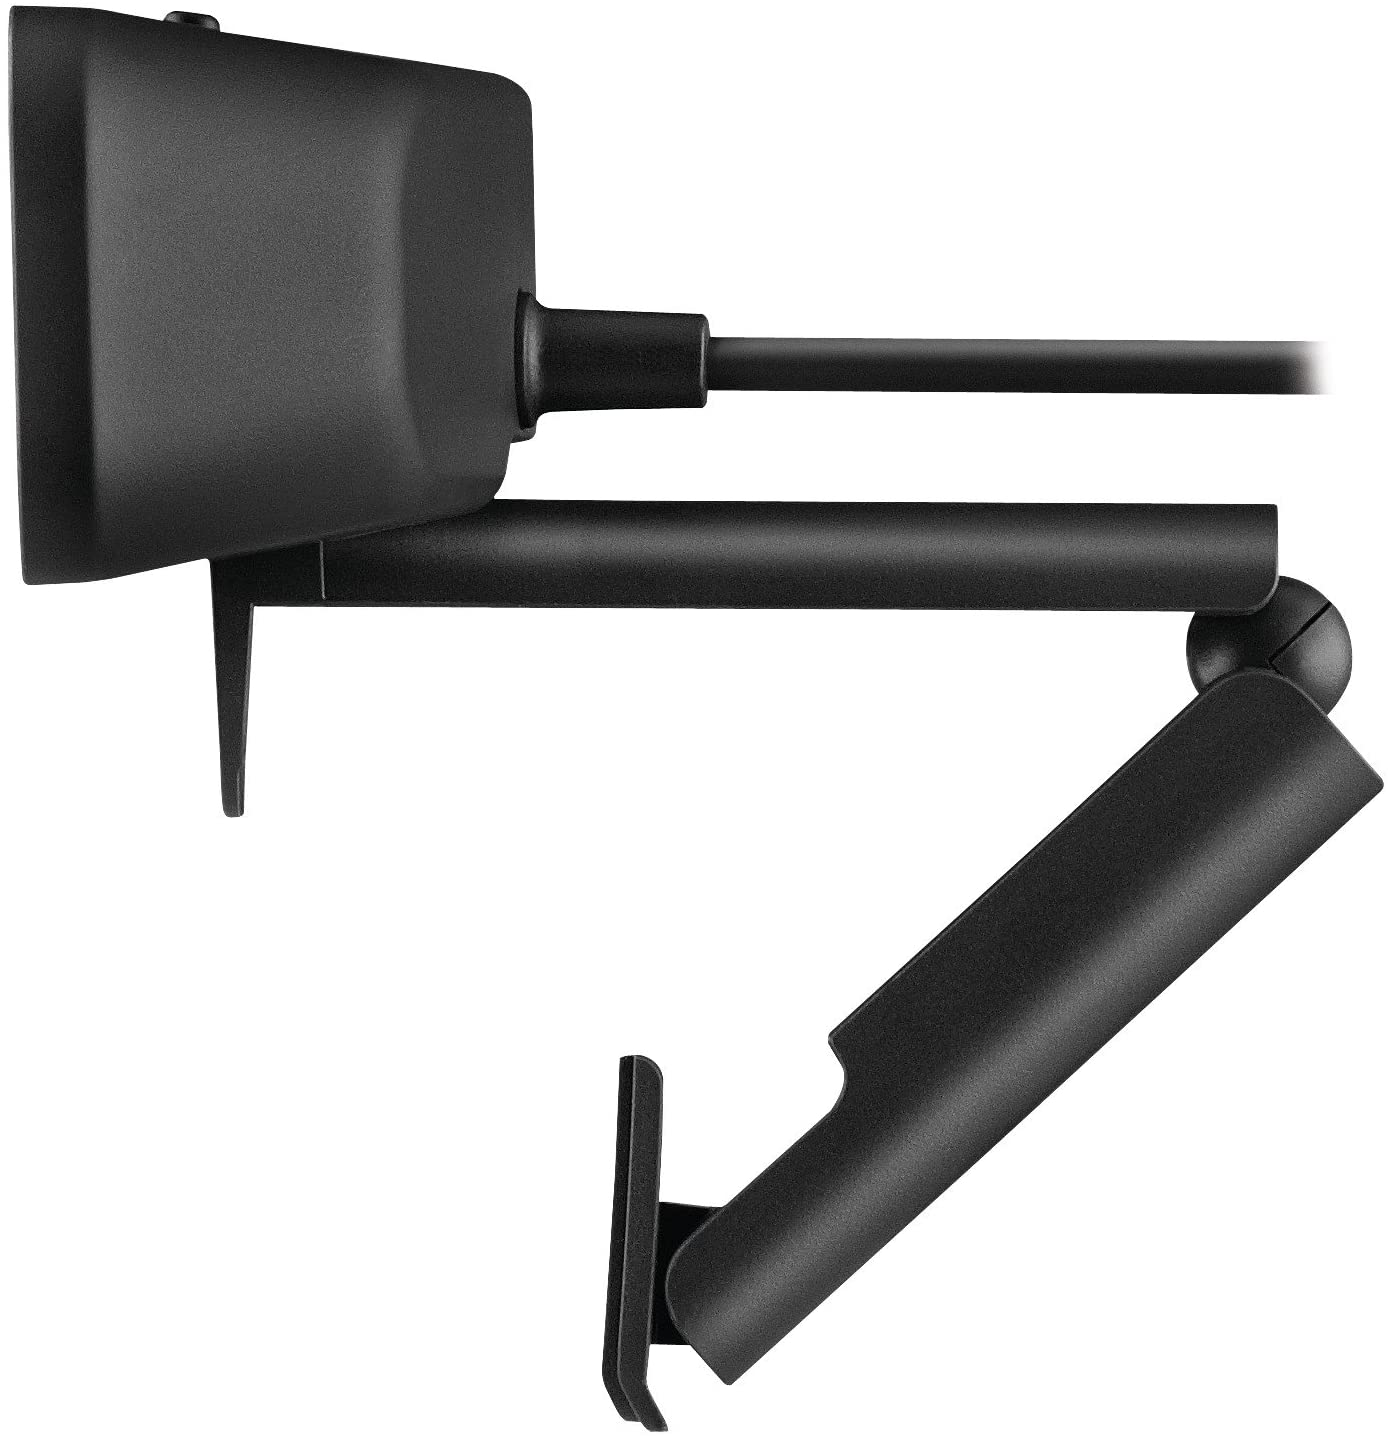 WebCam Logitech C925e Full HD 1080p 30fps Tecnologia RightLight 2 - 960-001075